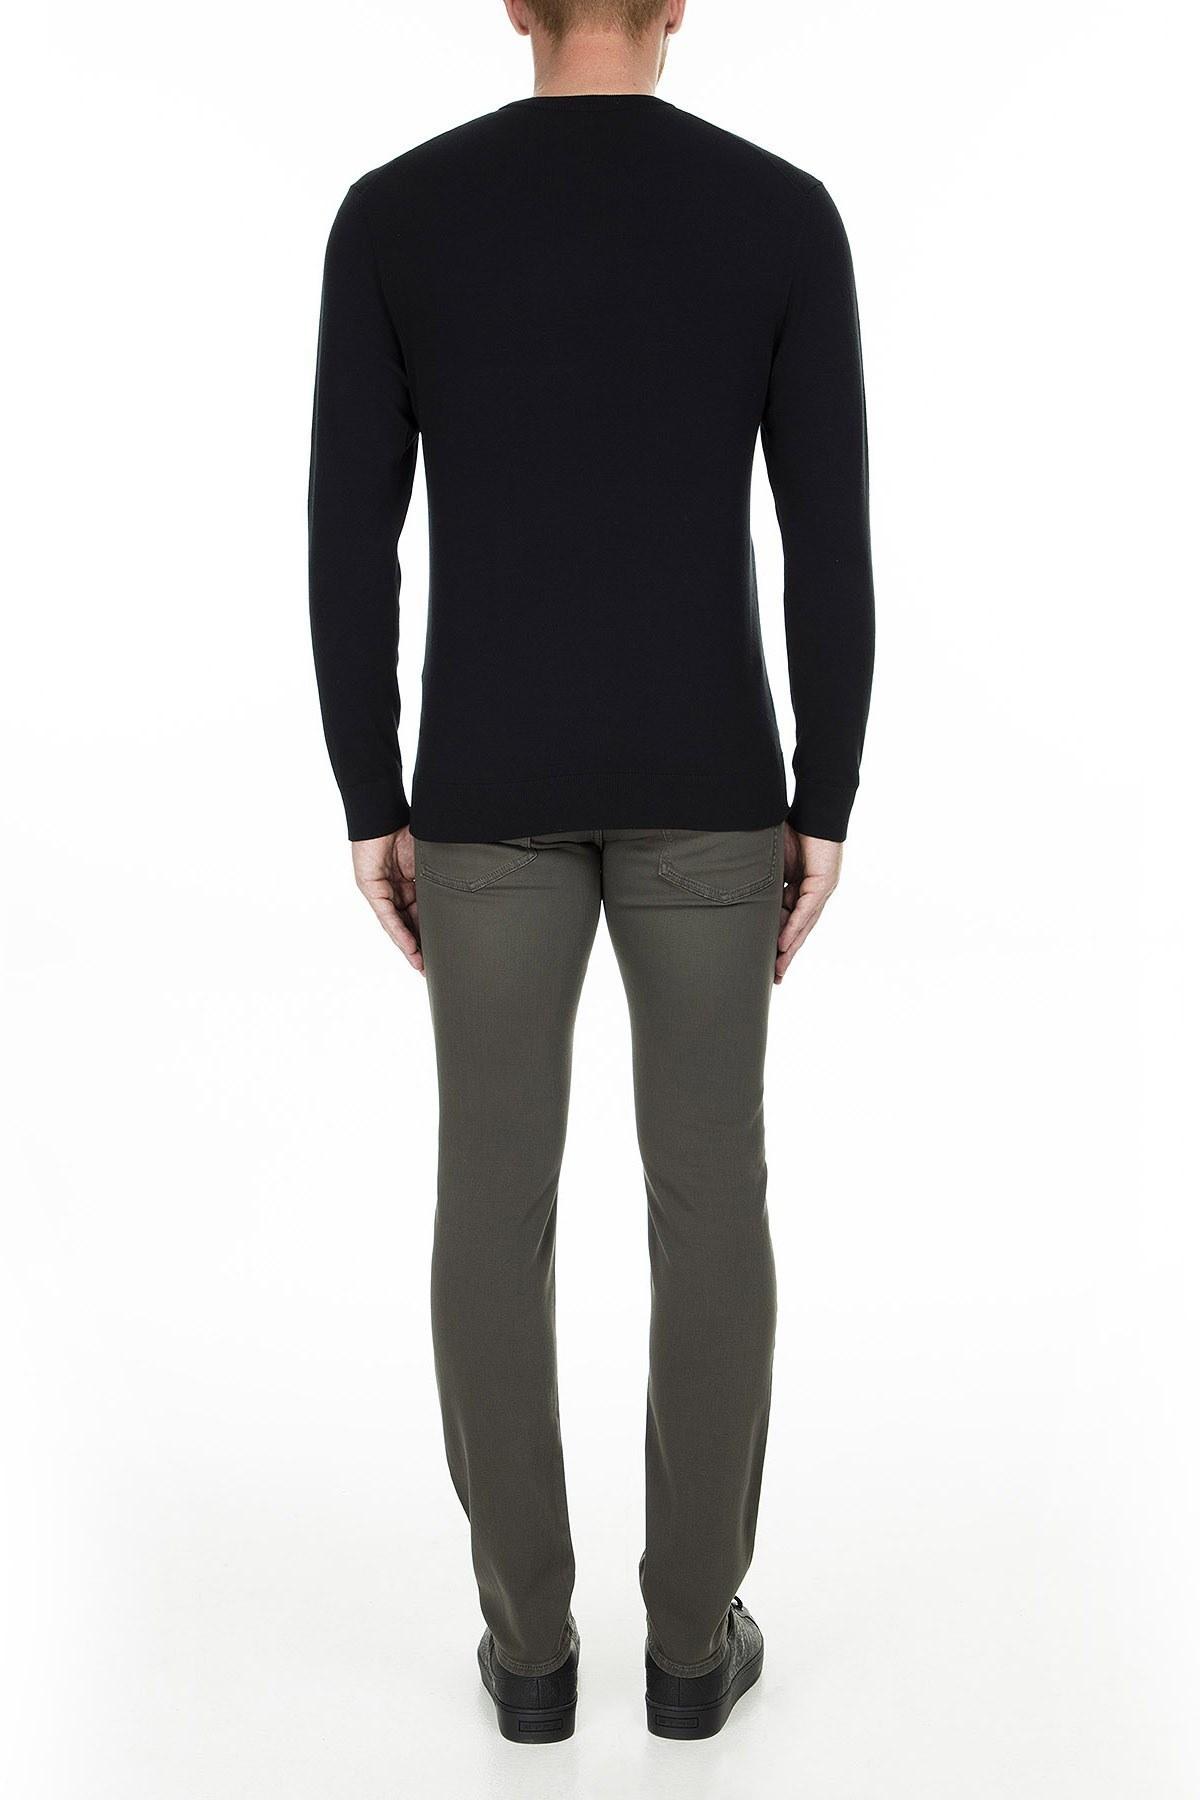 Hugo Boss Jeans Erkek Kot Pantolon 50415879 342 HAKİ